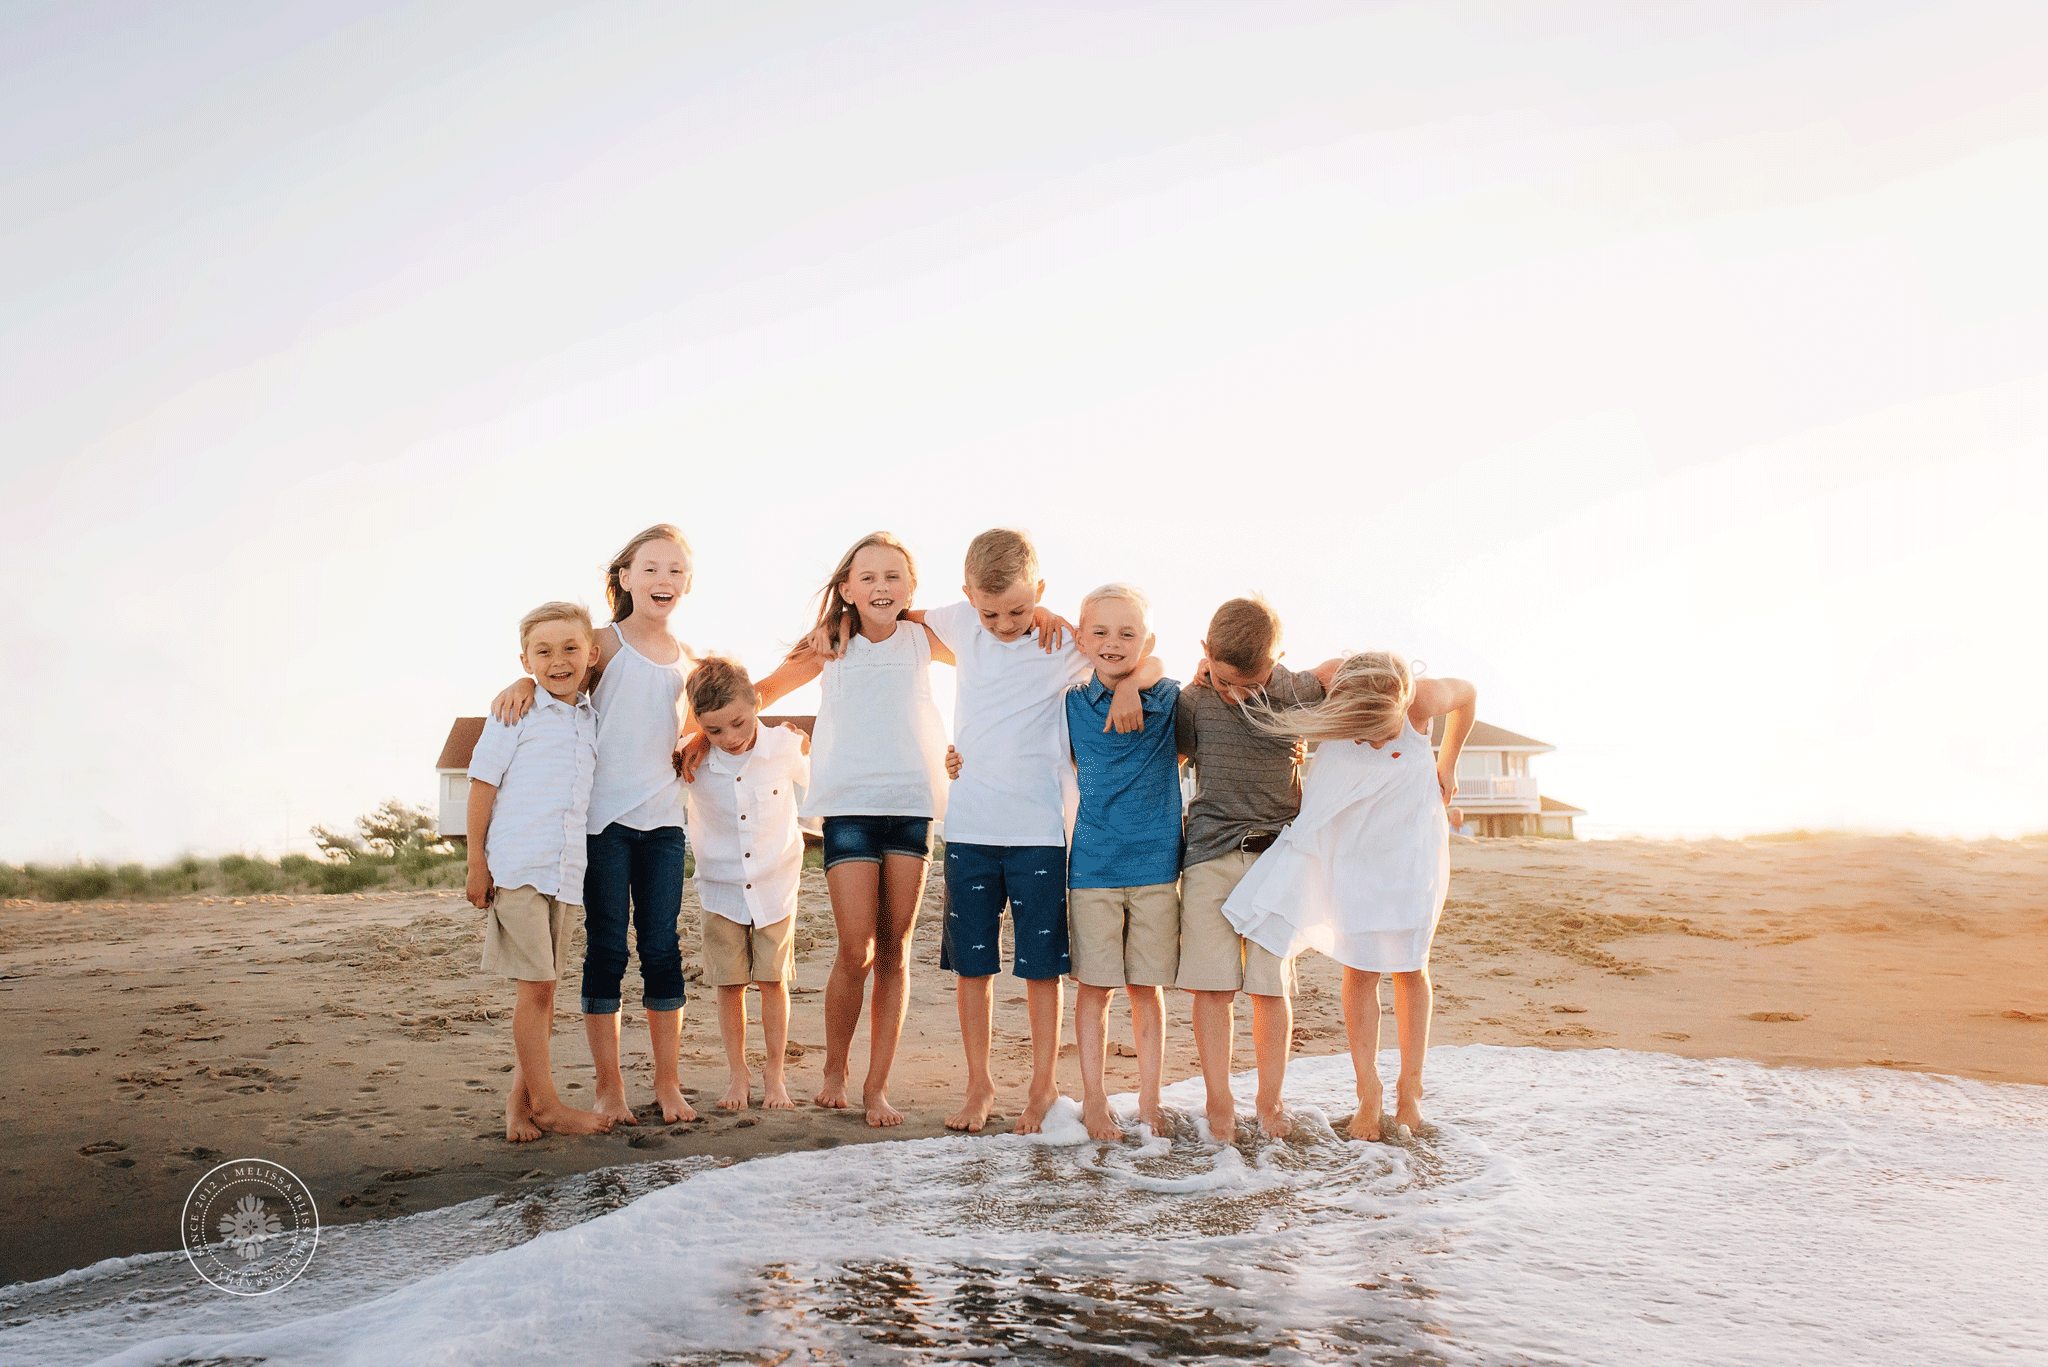 melissa-bliss-photography-sandbridge-beach-family-photographers-virignia-beach-va.png